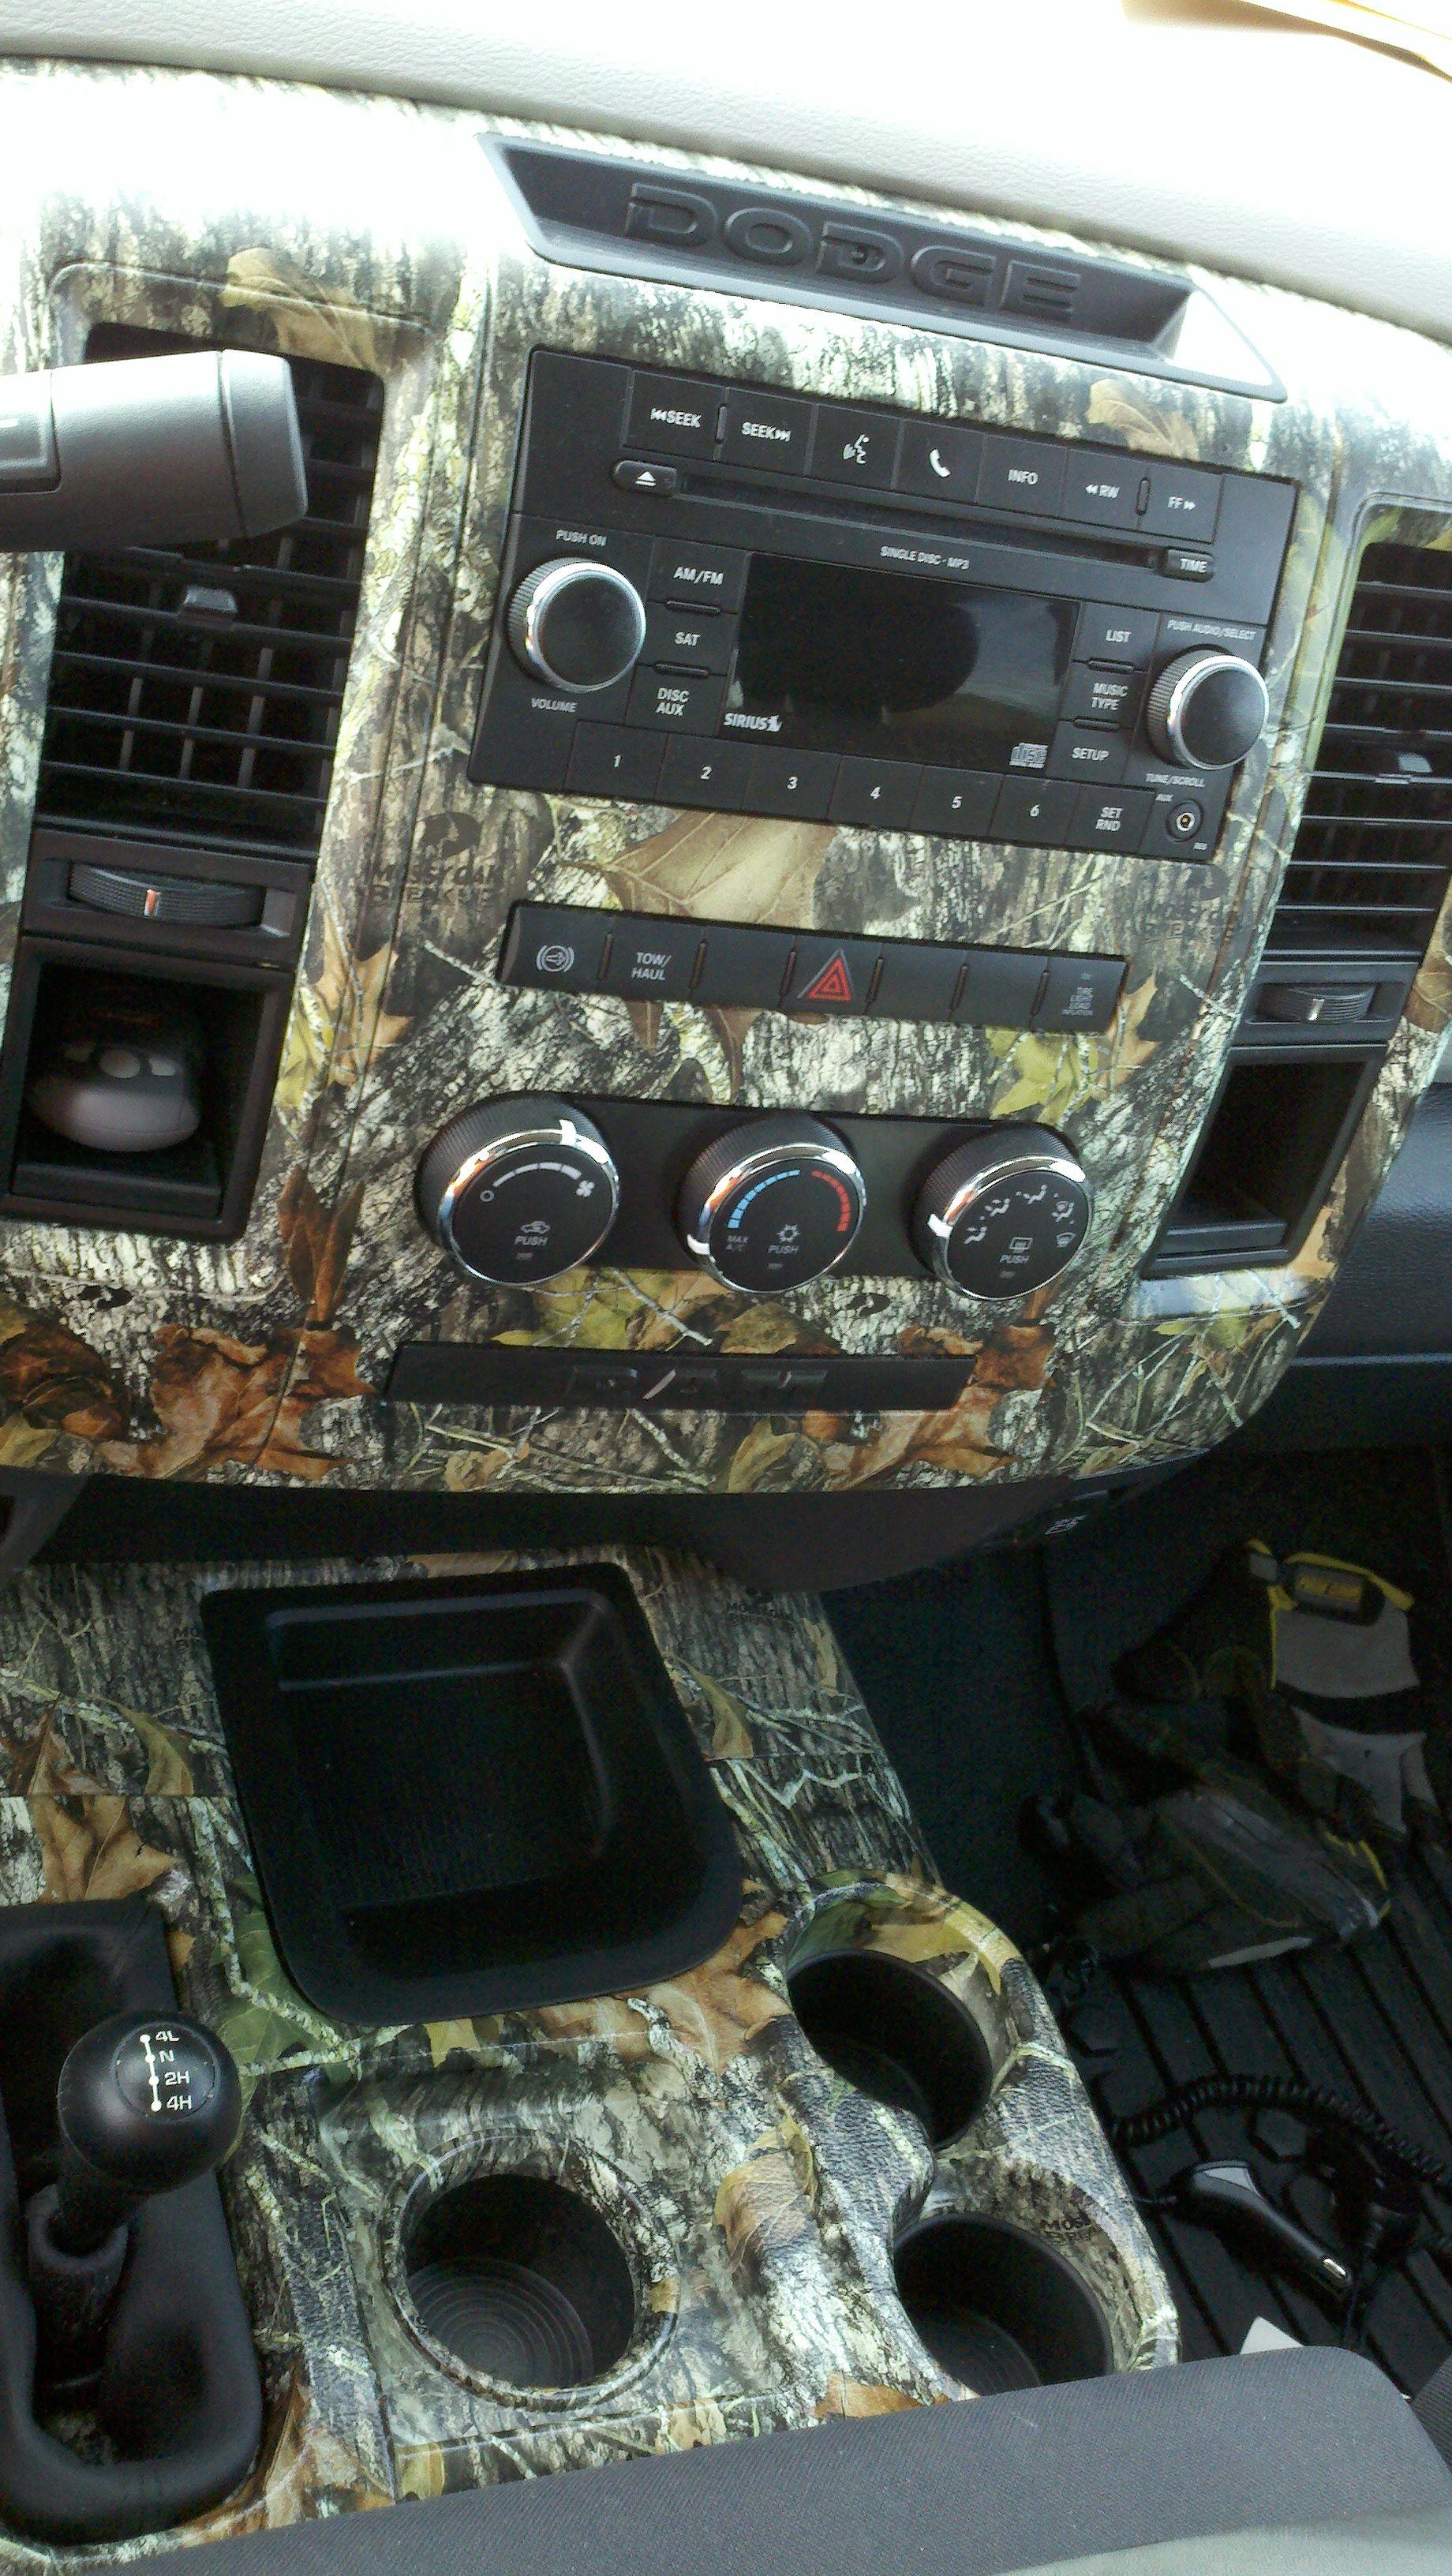 wrap wraps interior for spydervinyl camo can spyder cupboards interiorvinyl car am vinyl custom trucks